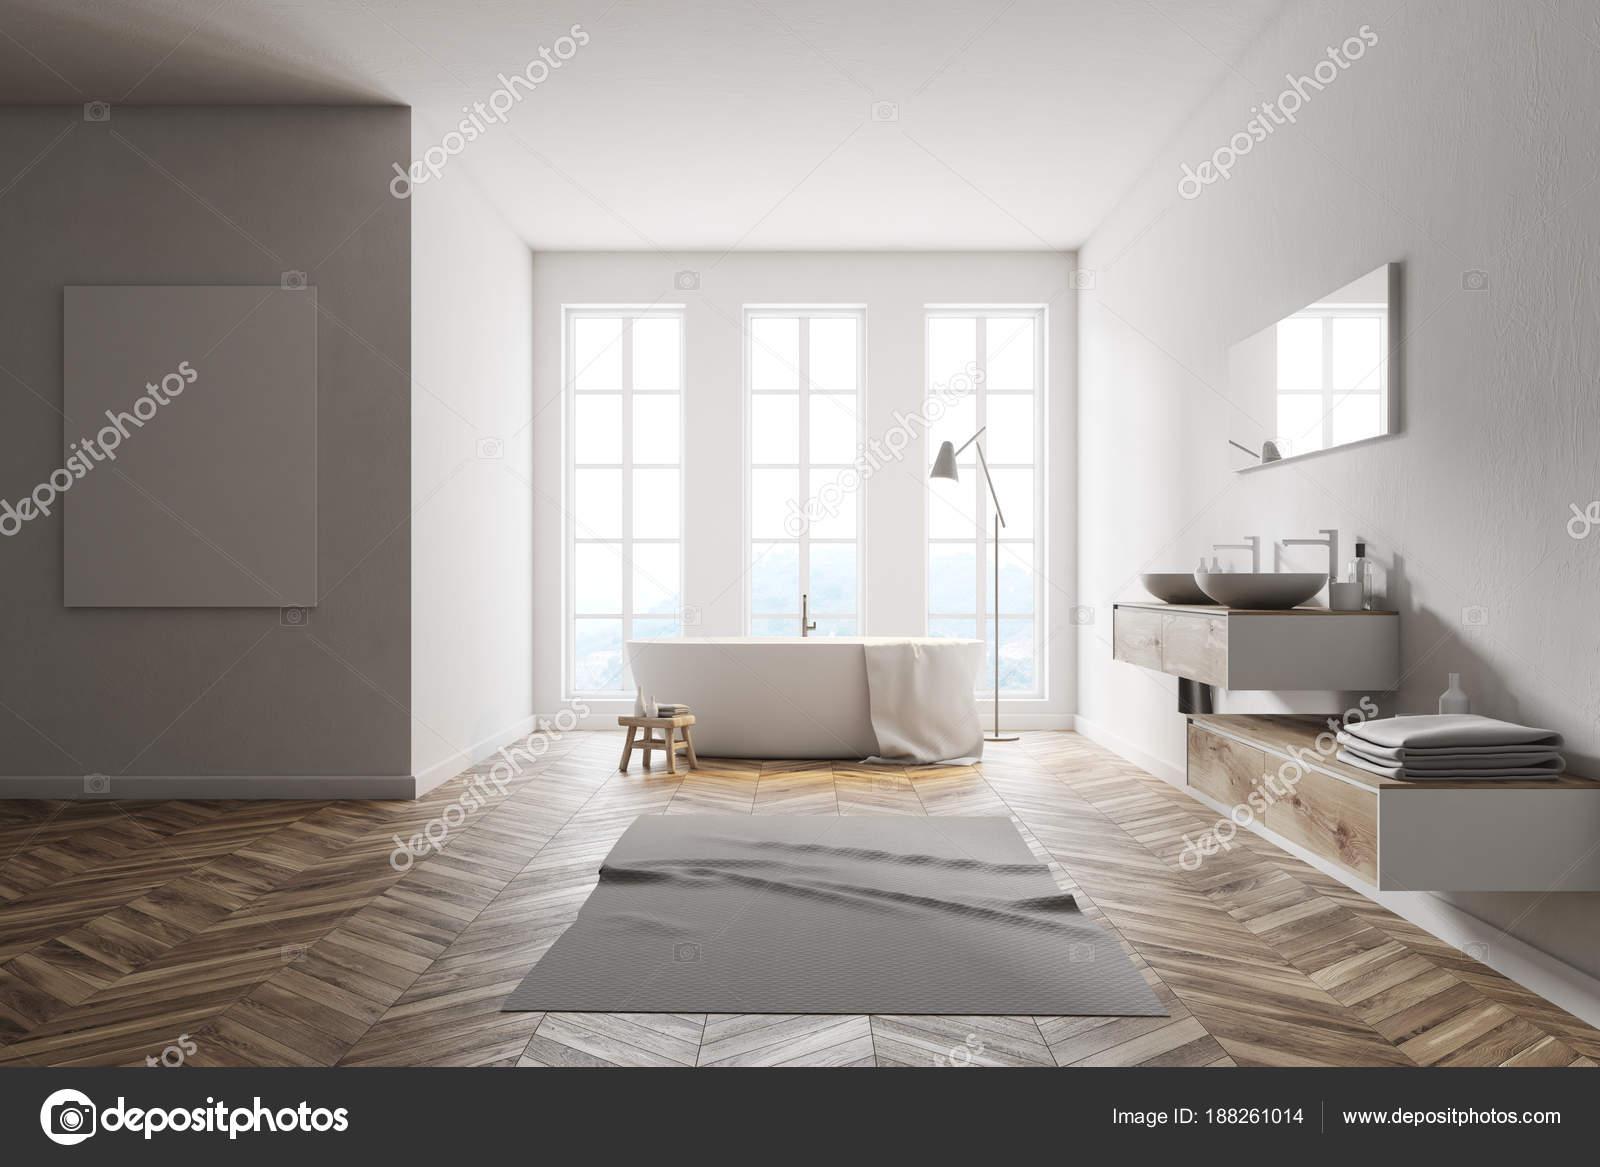 Minimalistische witte badkamer poster u stockfoto